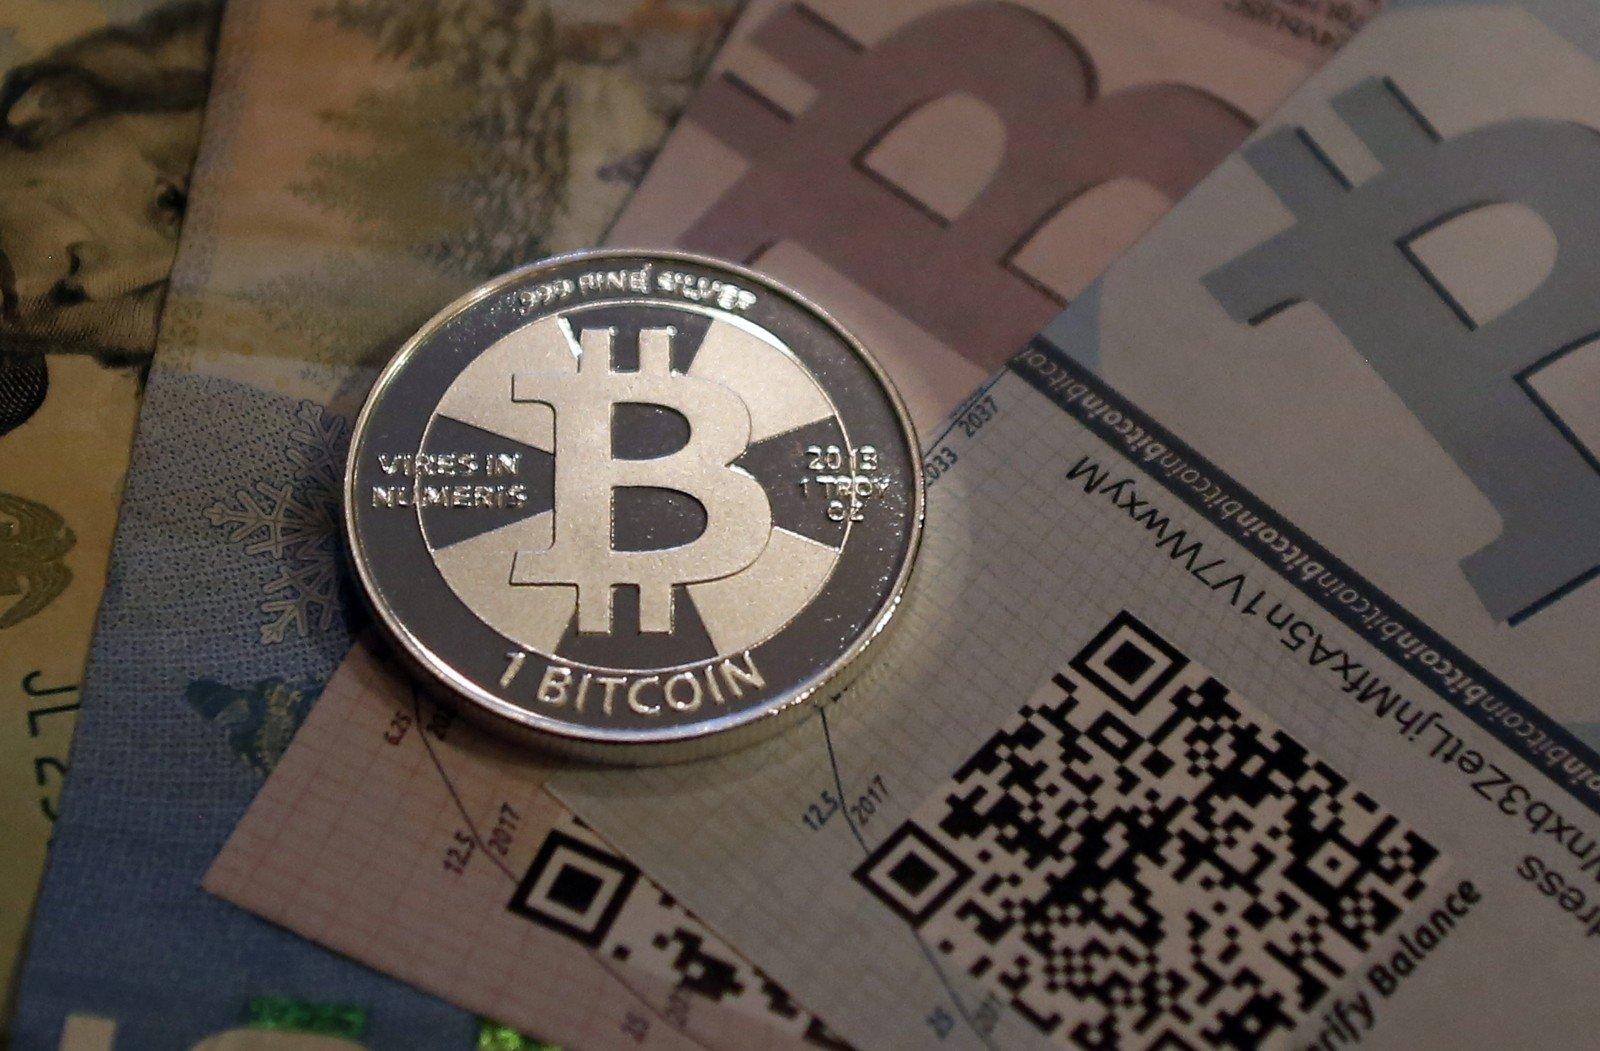 Balto popieriaus bitcoin satoshi nakamoto. Bitcoin Atm Investicijos Investicijos į bitcoin didėja